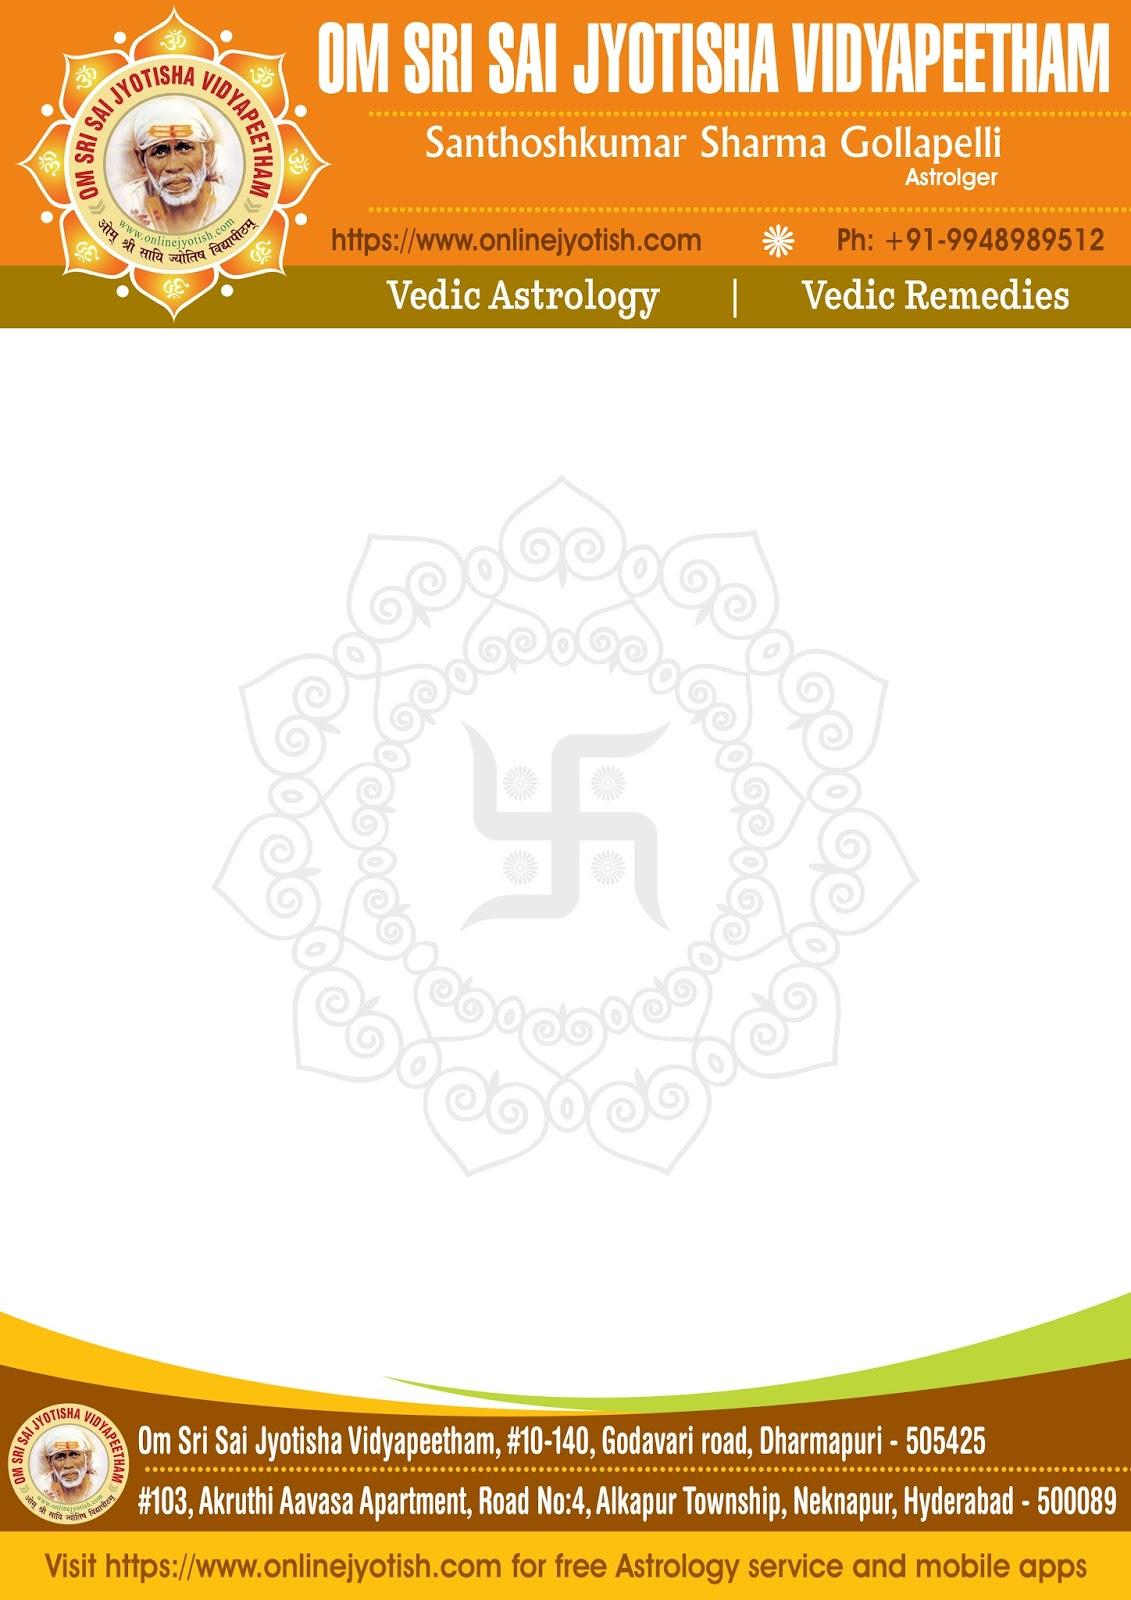 om sri sai jyotisha vidyapeetham letter head design ideas - Letterhead Design Ideas